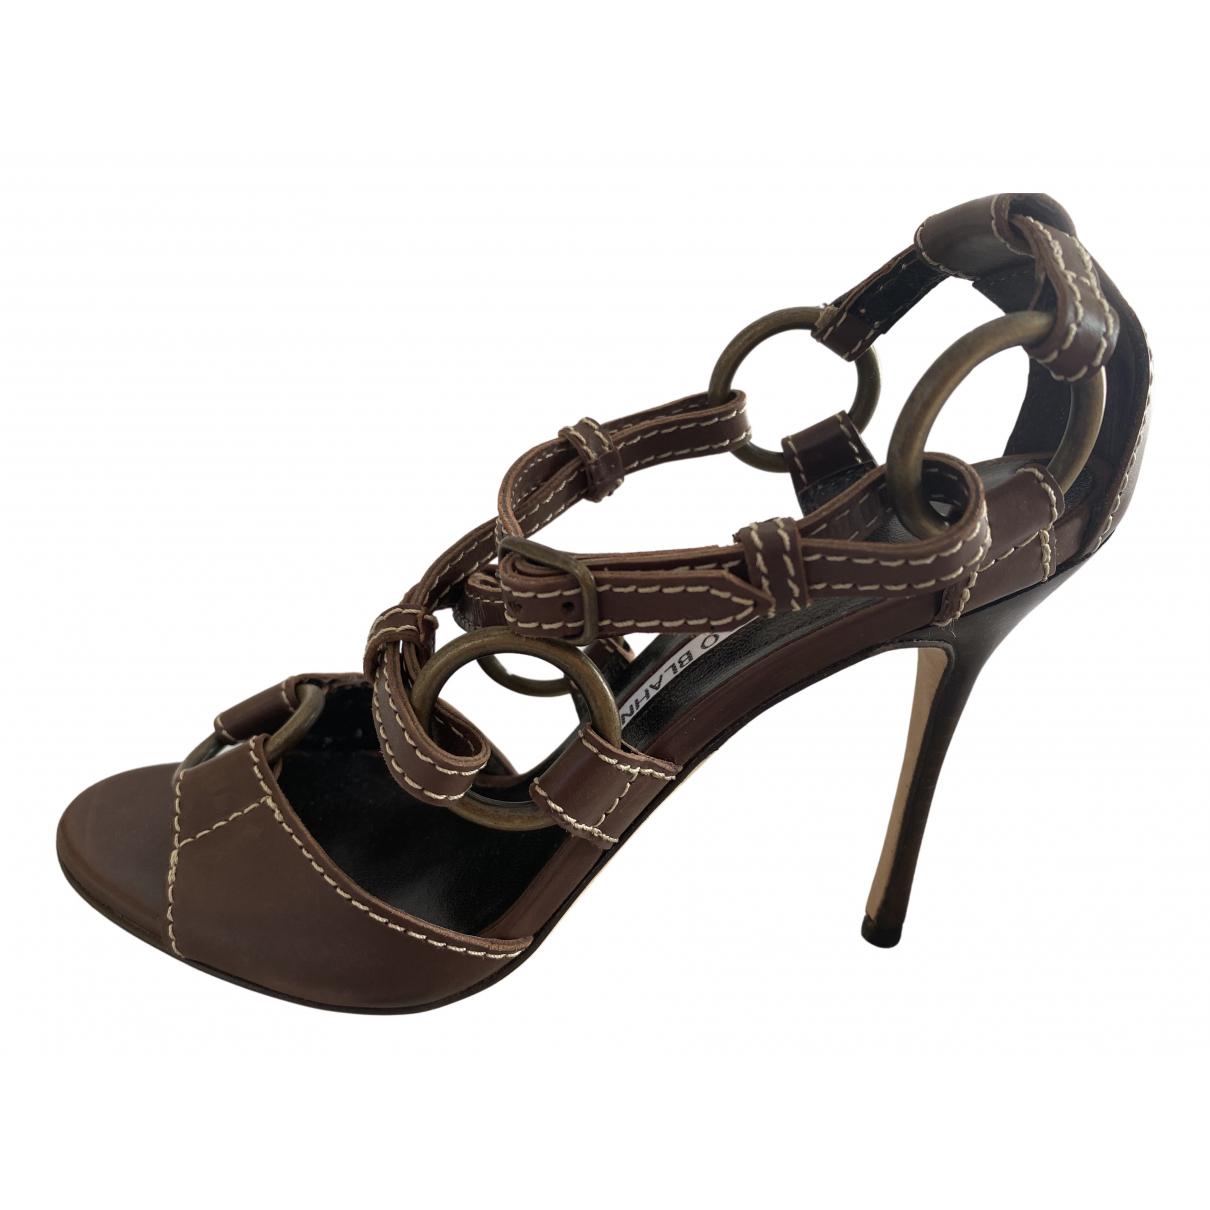 Manolo Blahnik \N Brown Leather Sandals for Women 35.5 EU